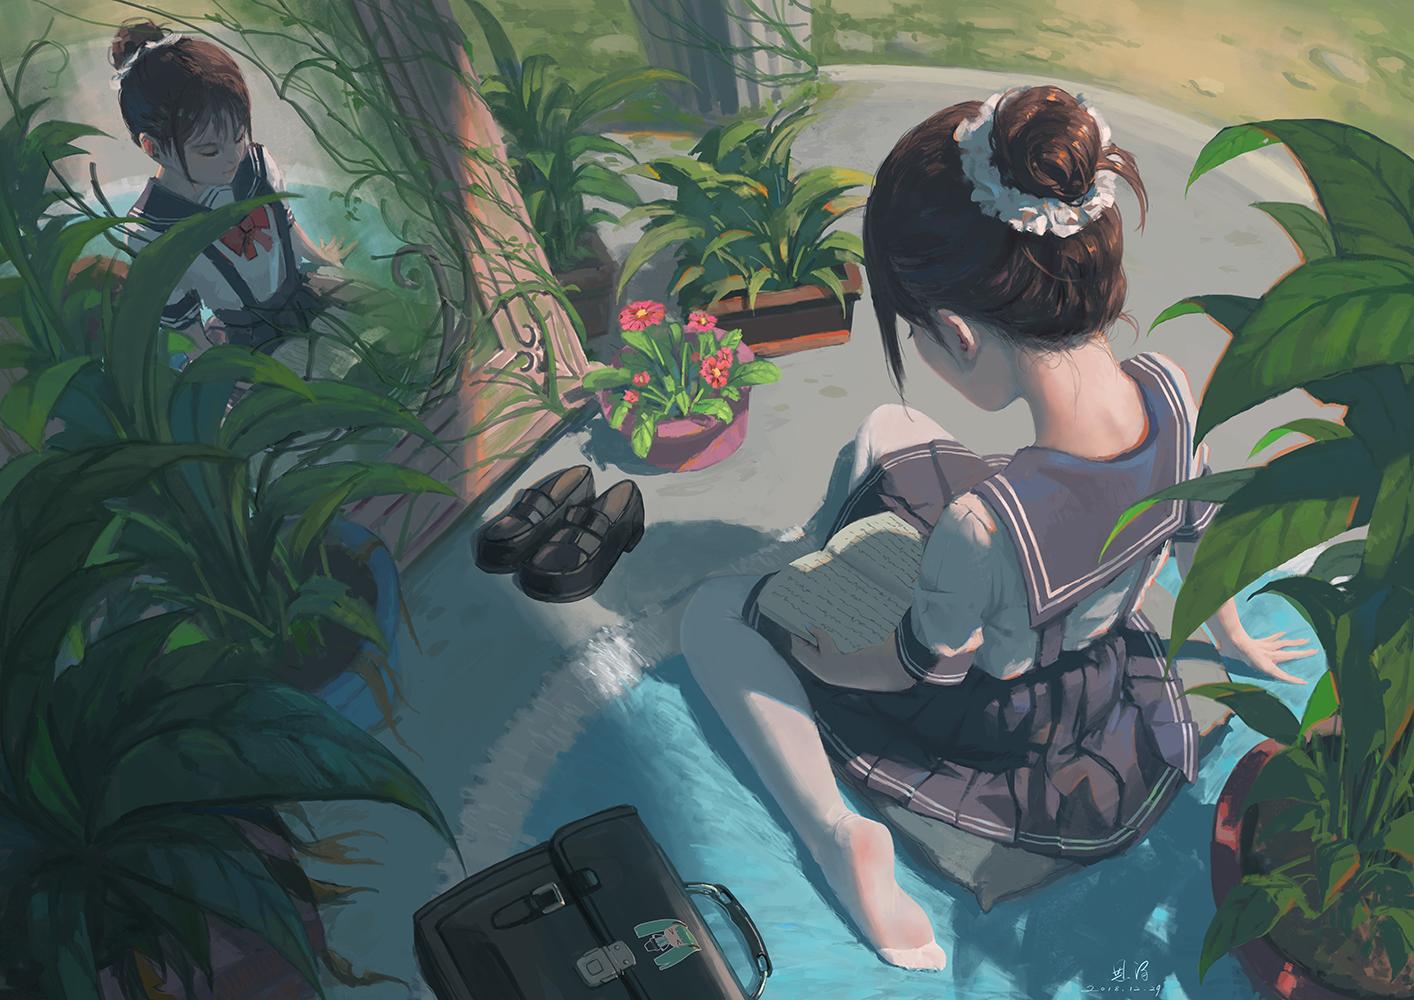 Anime 1414x1000 anime girls plants mirror school uniform boots brunette flowerpot reading sailor uniform